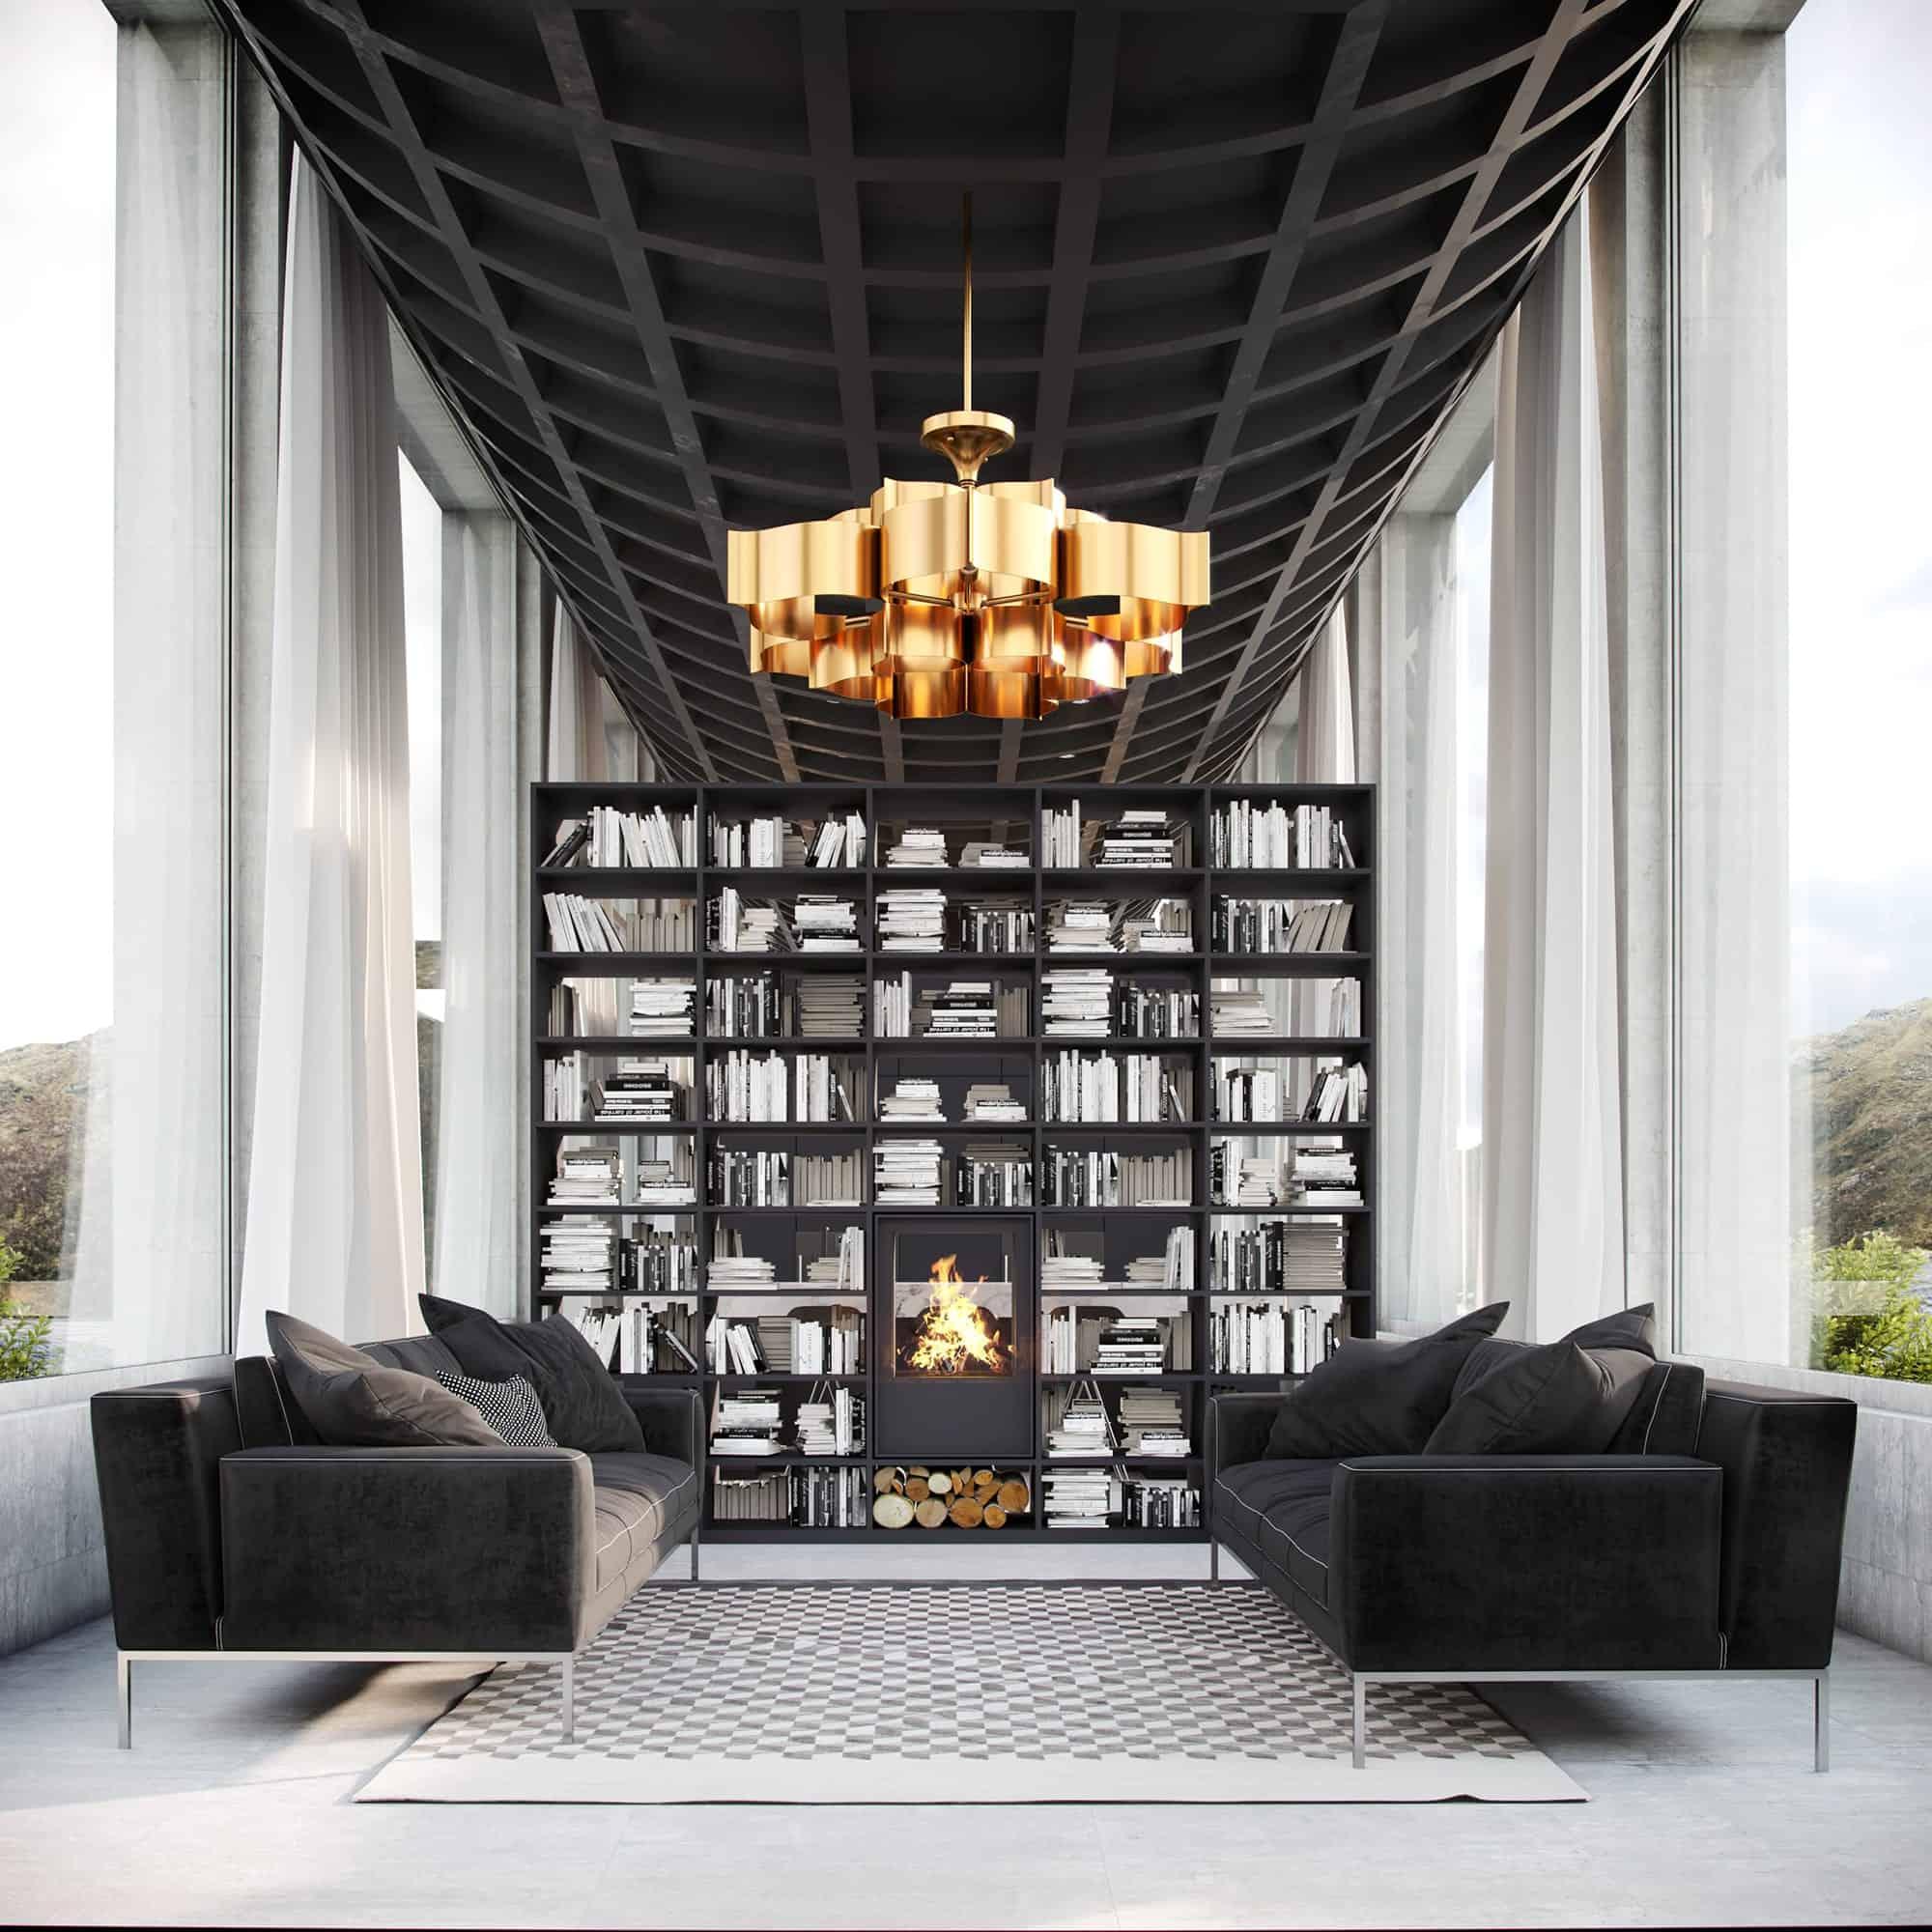 Wonderful Structure Located in Northern Norway Designed by Vladimir Konovalov